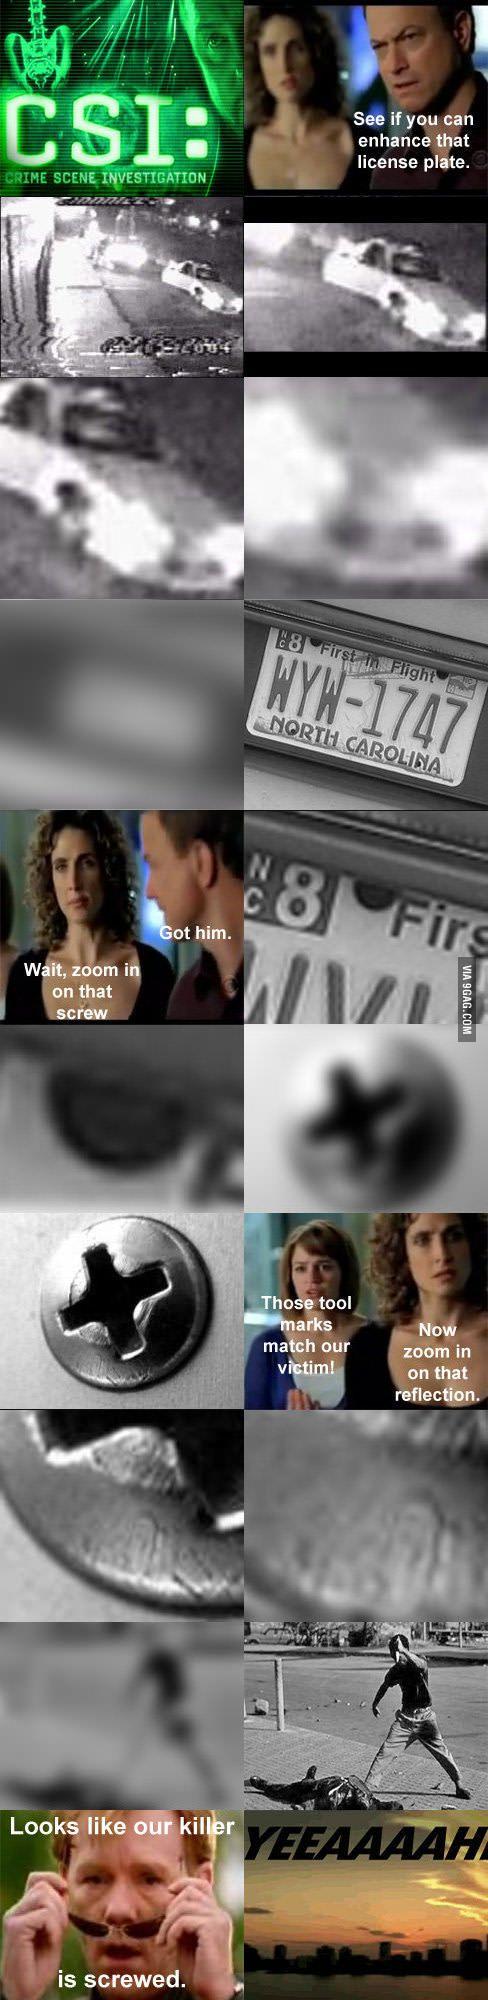 csi meme del zoom